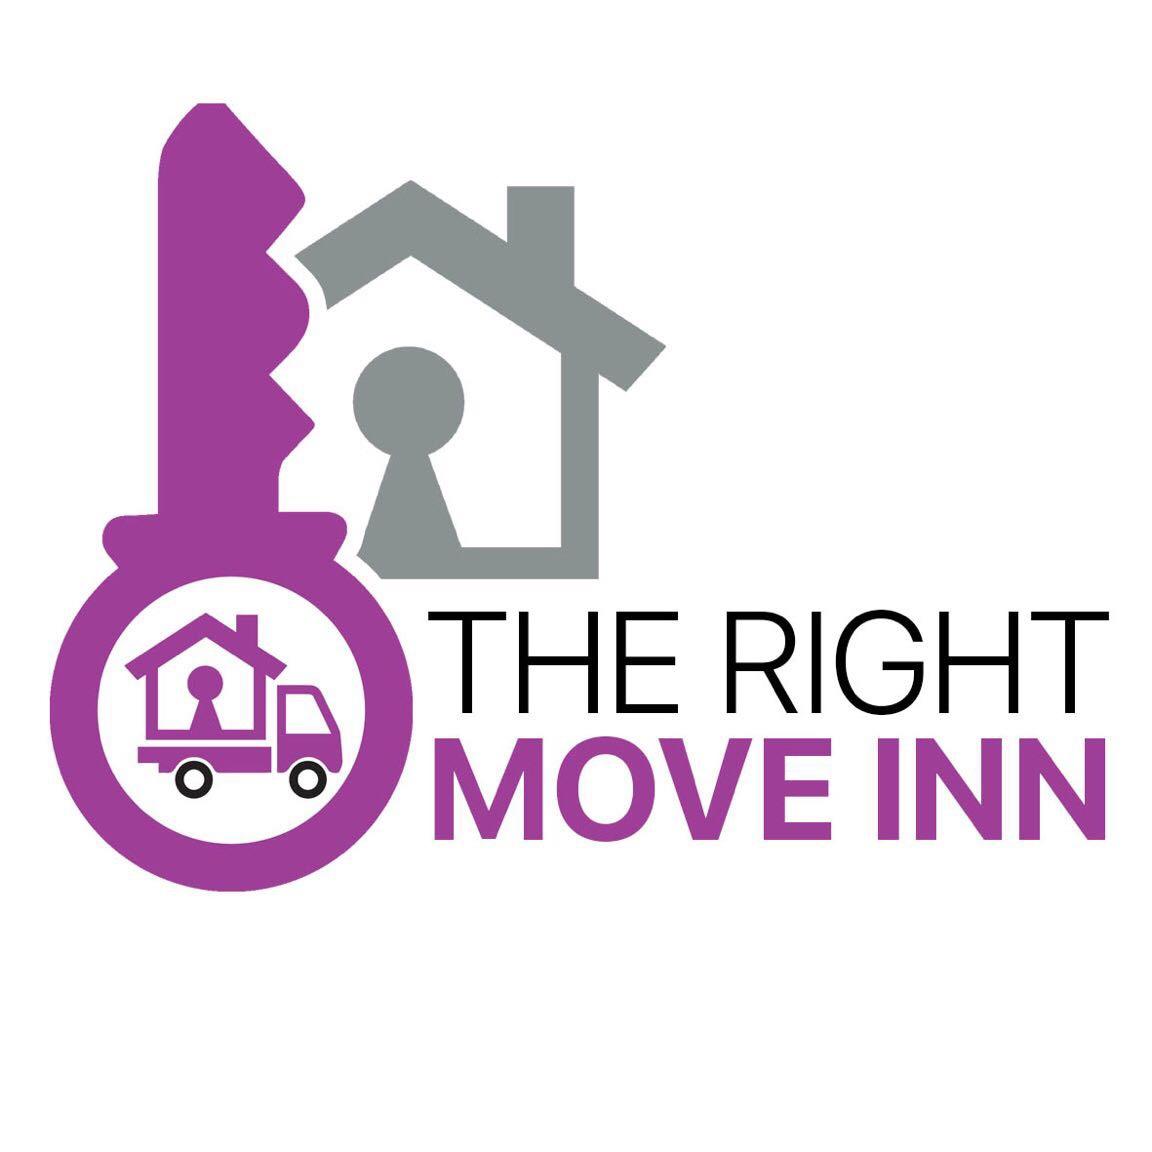 The Right Move Inn